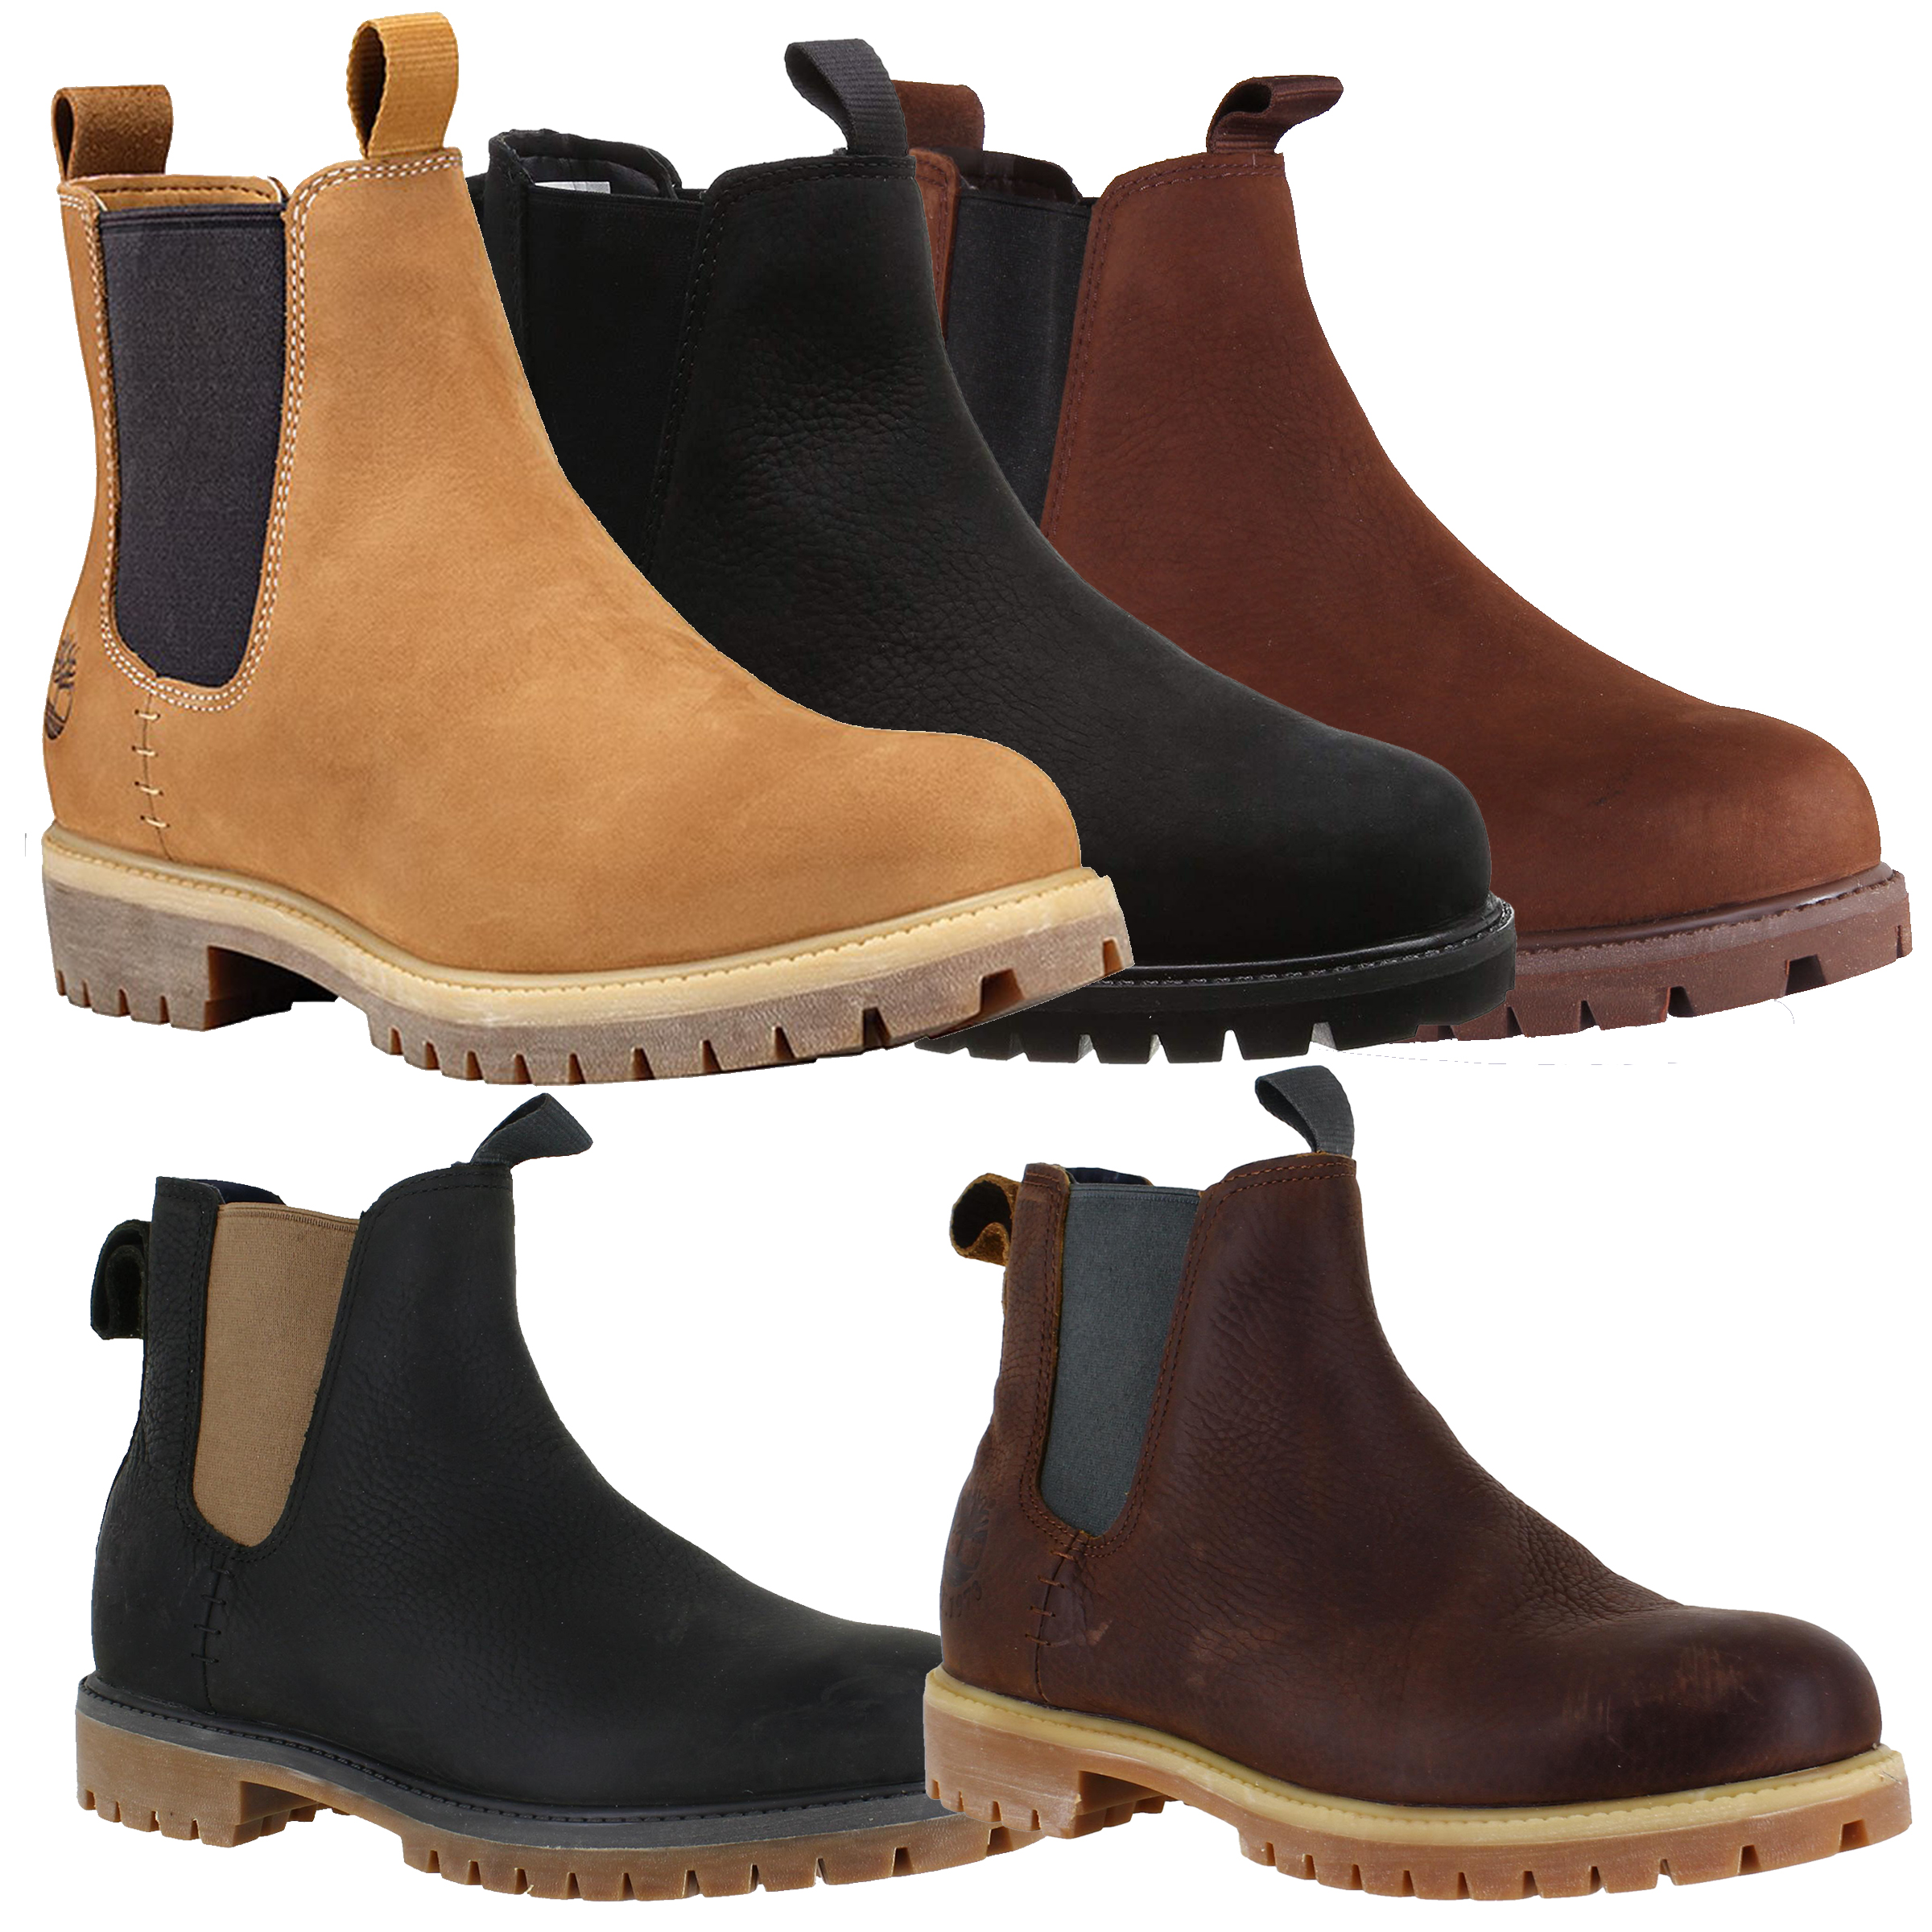 super especiales 2019 auténtico última tecnología Mens Timberland 6-inch Pull On Nubuck Leather Chelsea Boots Sizes ...